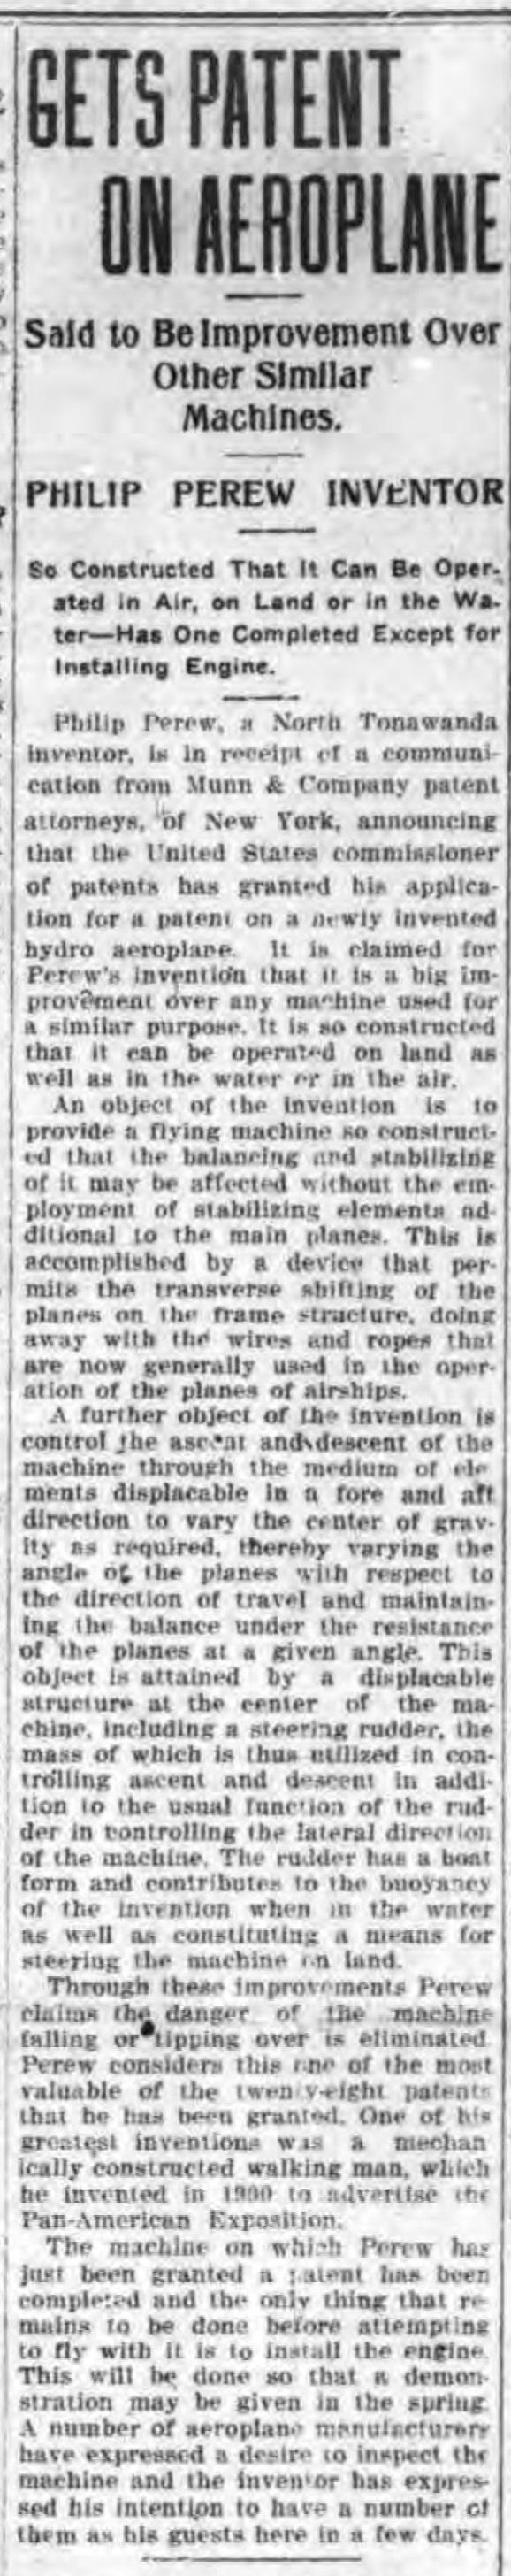 Get patent on aeroplane, article (Tonawanda News, 1917-01-20).jpg